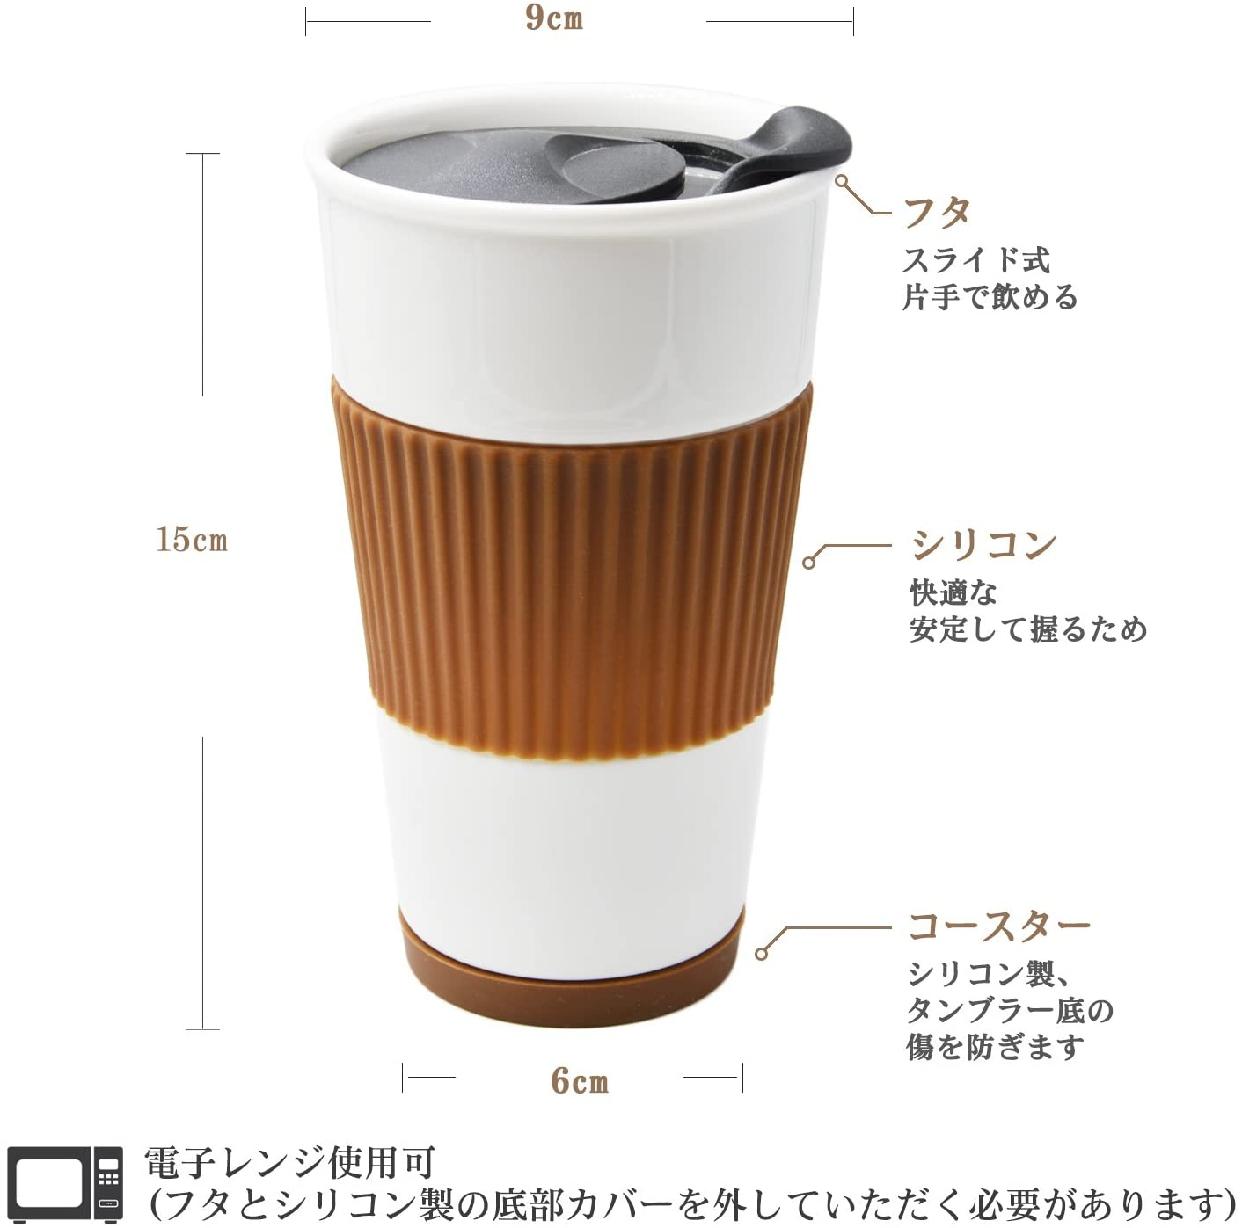 UDMG(ユーディーエムジー) 二重構造断熱コーヒーカップの商品画像3